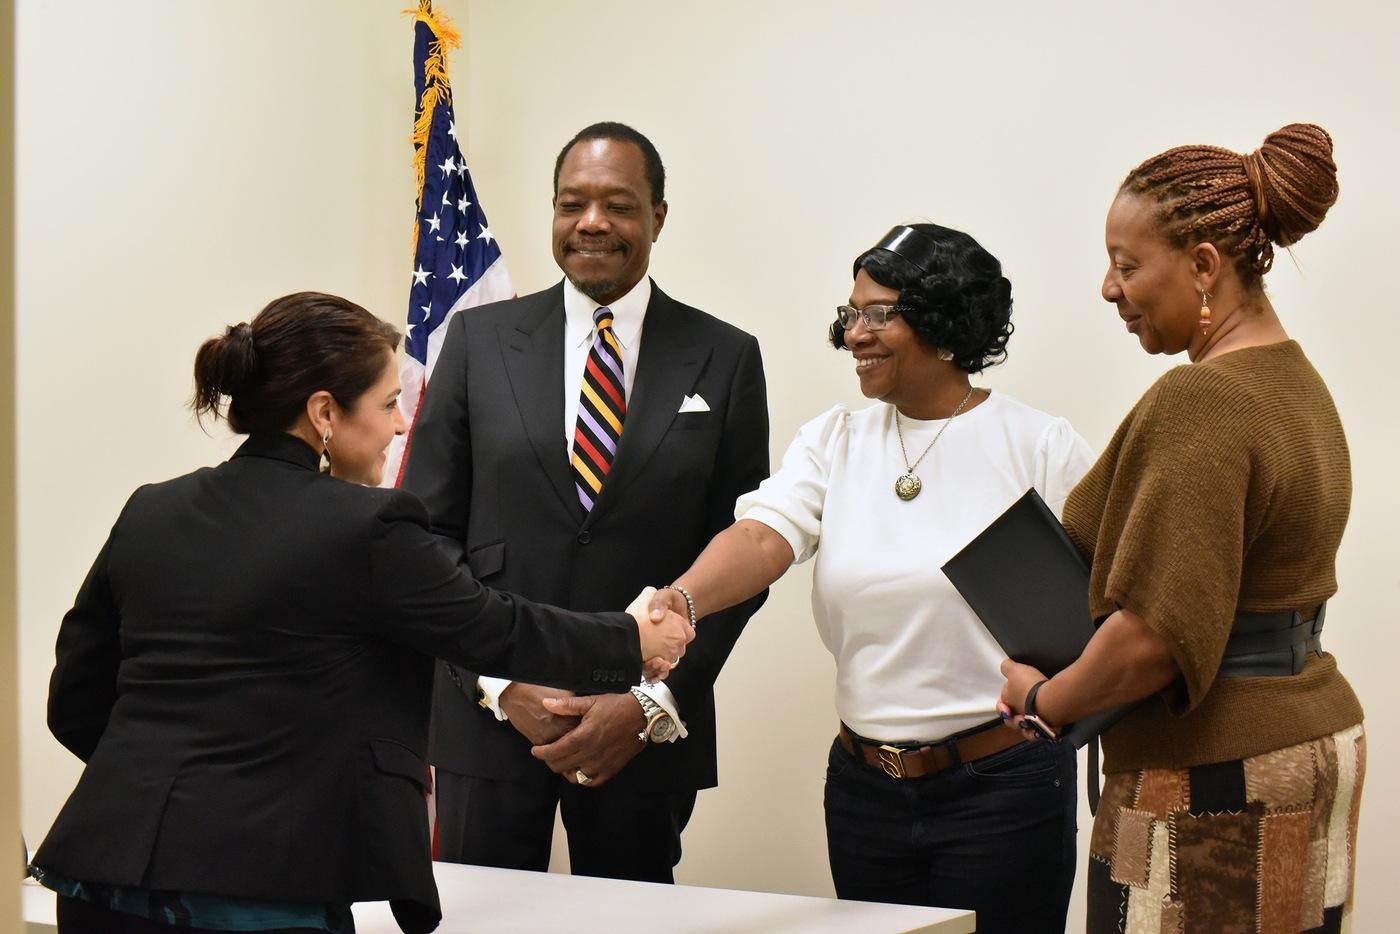 FBI Norfolk 2019 Director's Community Leadership Award recipient, Hampton Roads Diversity and Inclusion Consortium.